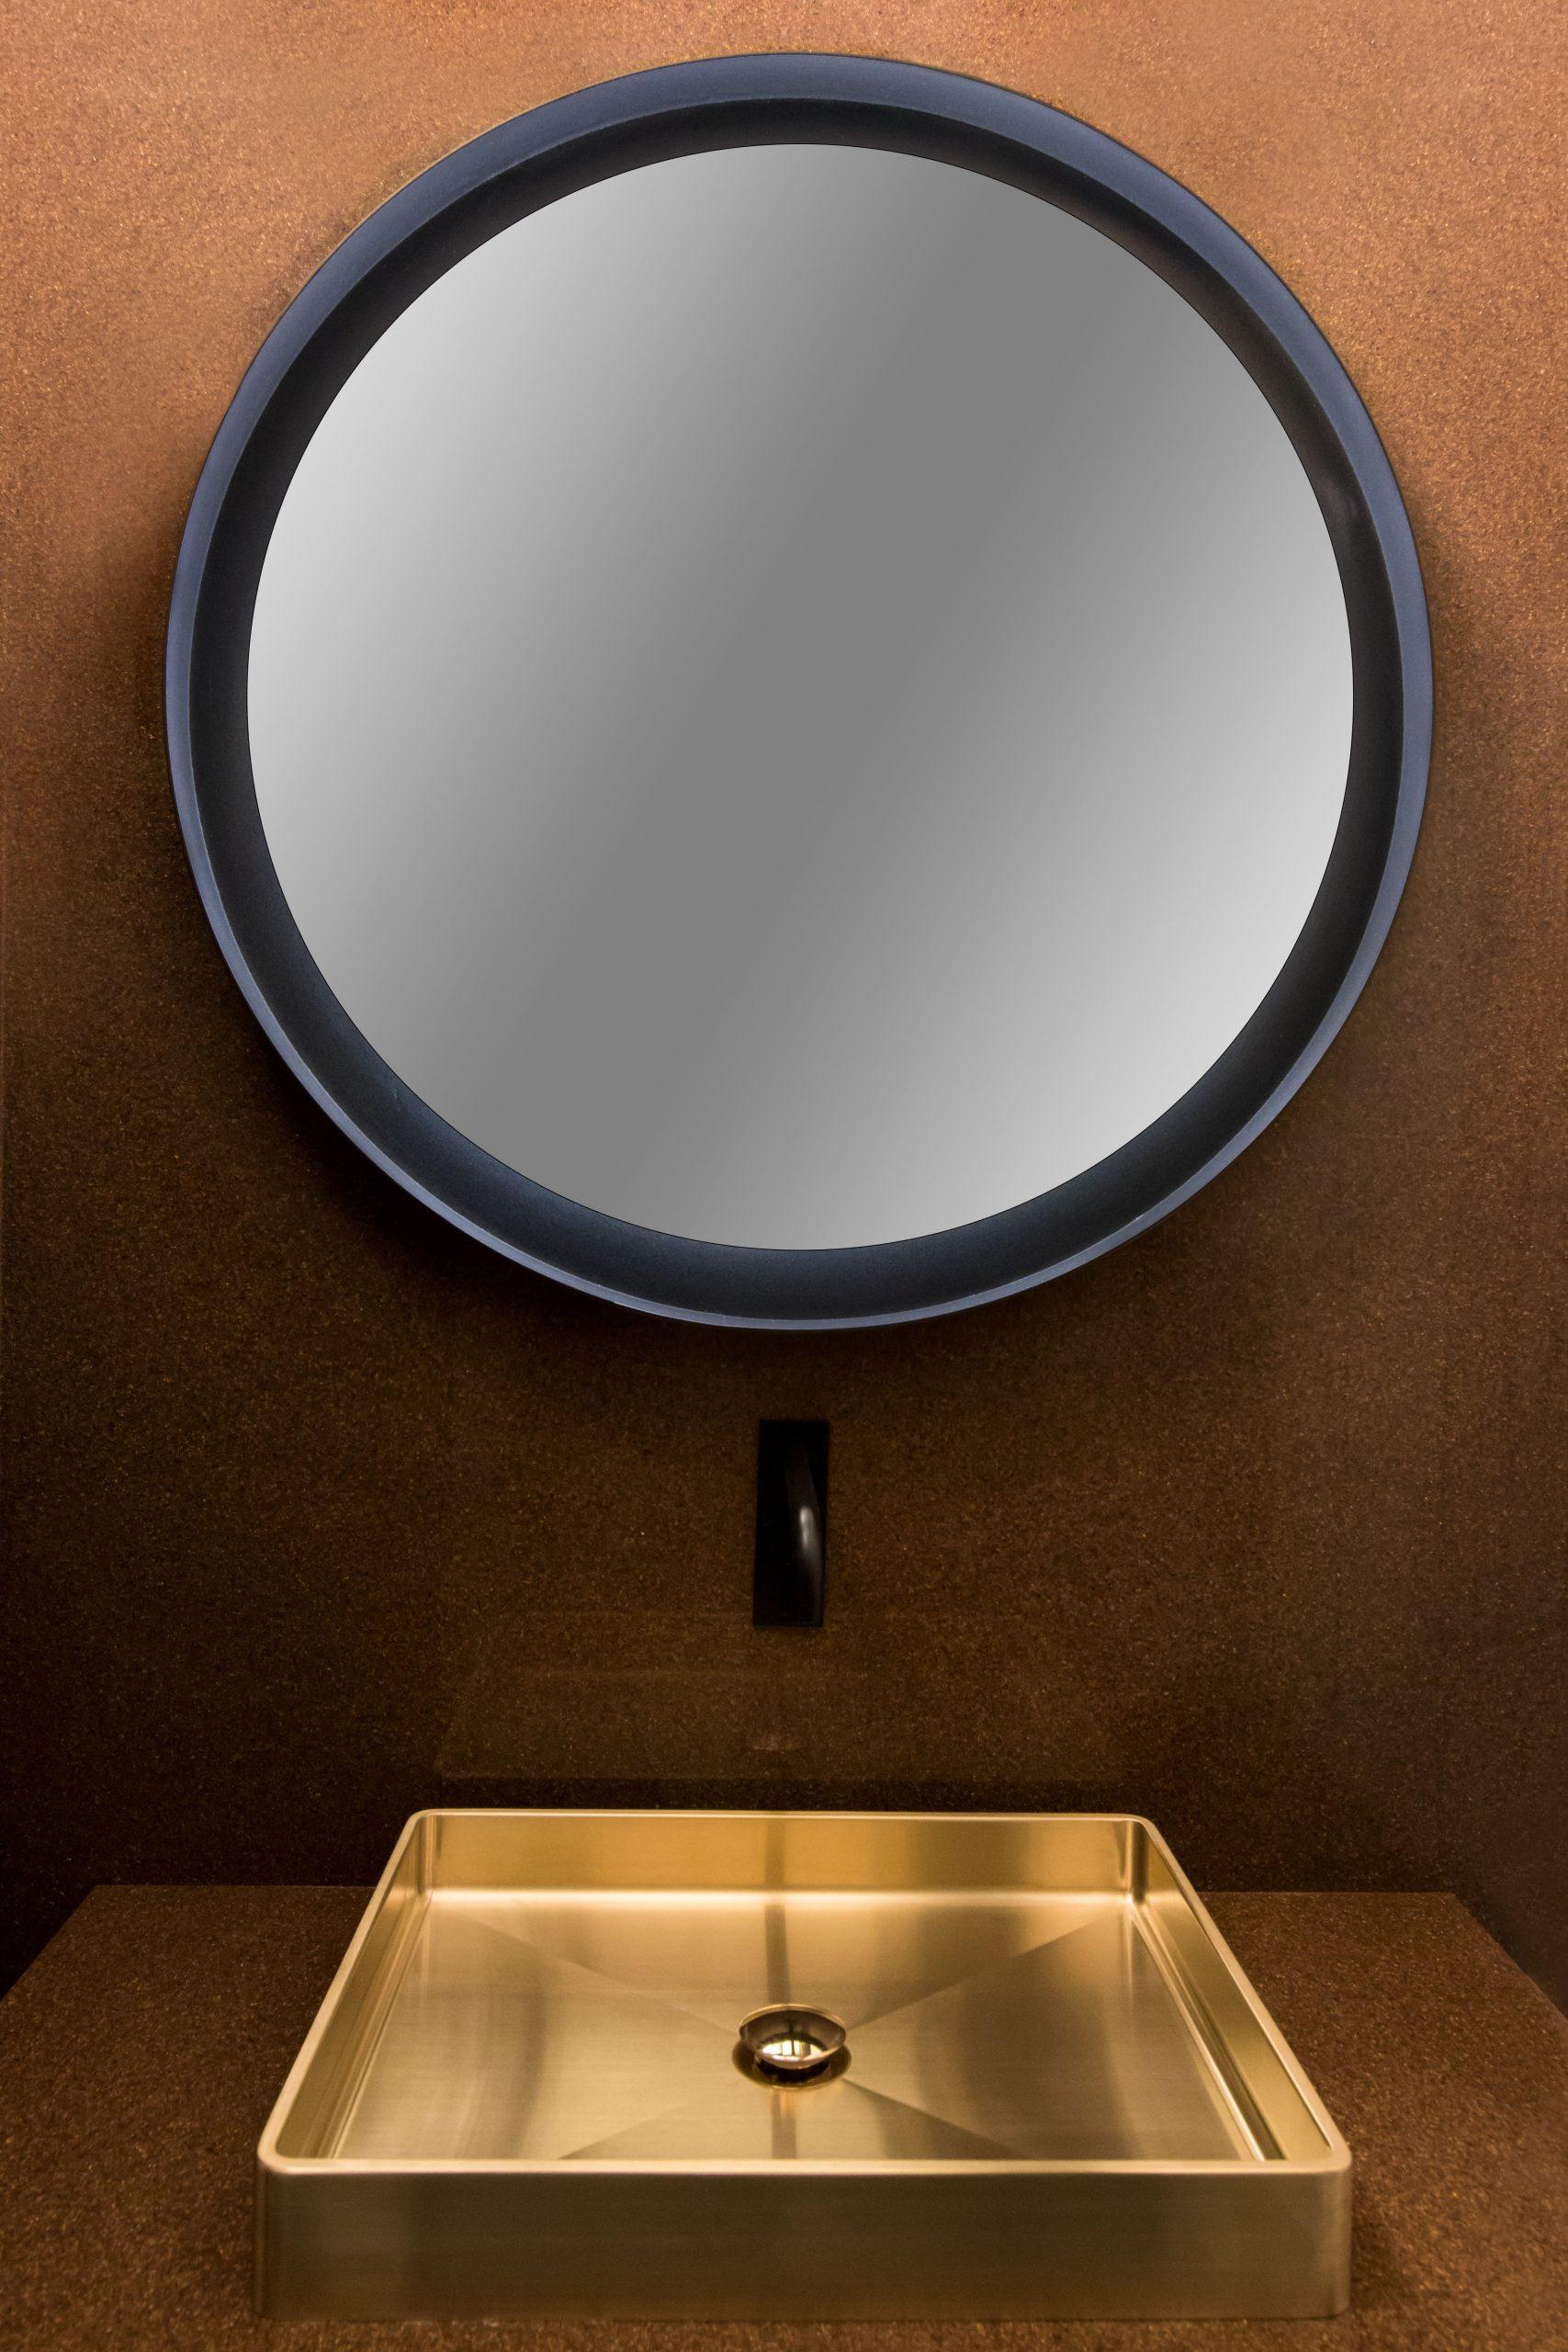 Mijn-bad-in-stijl-terracotta-badkamer-spiegel